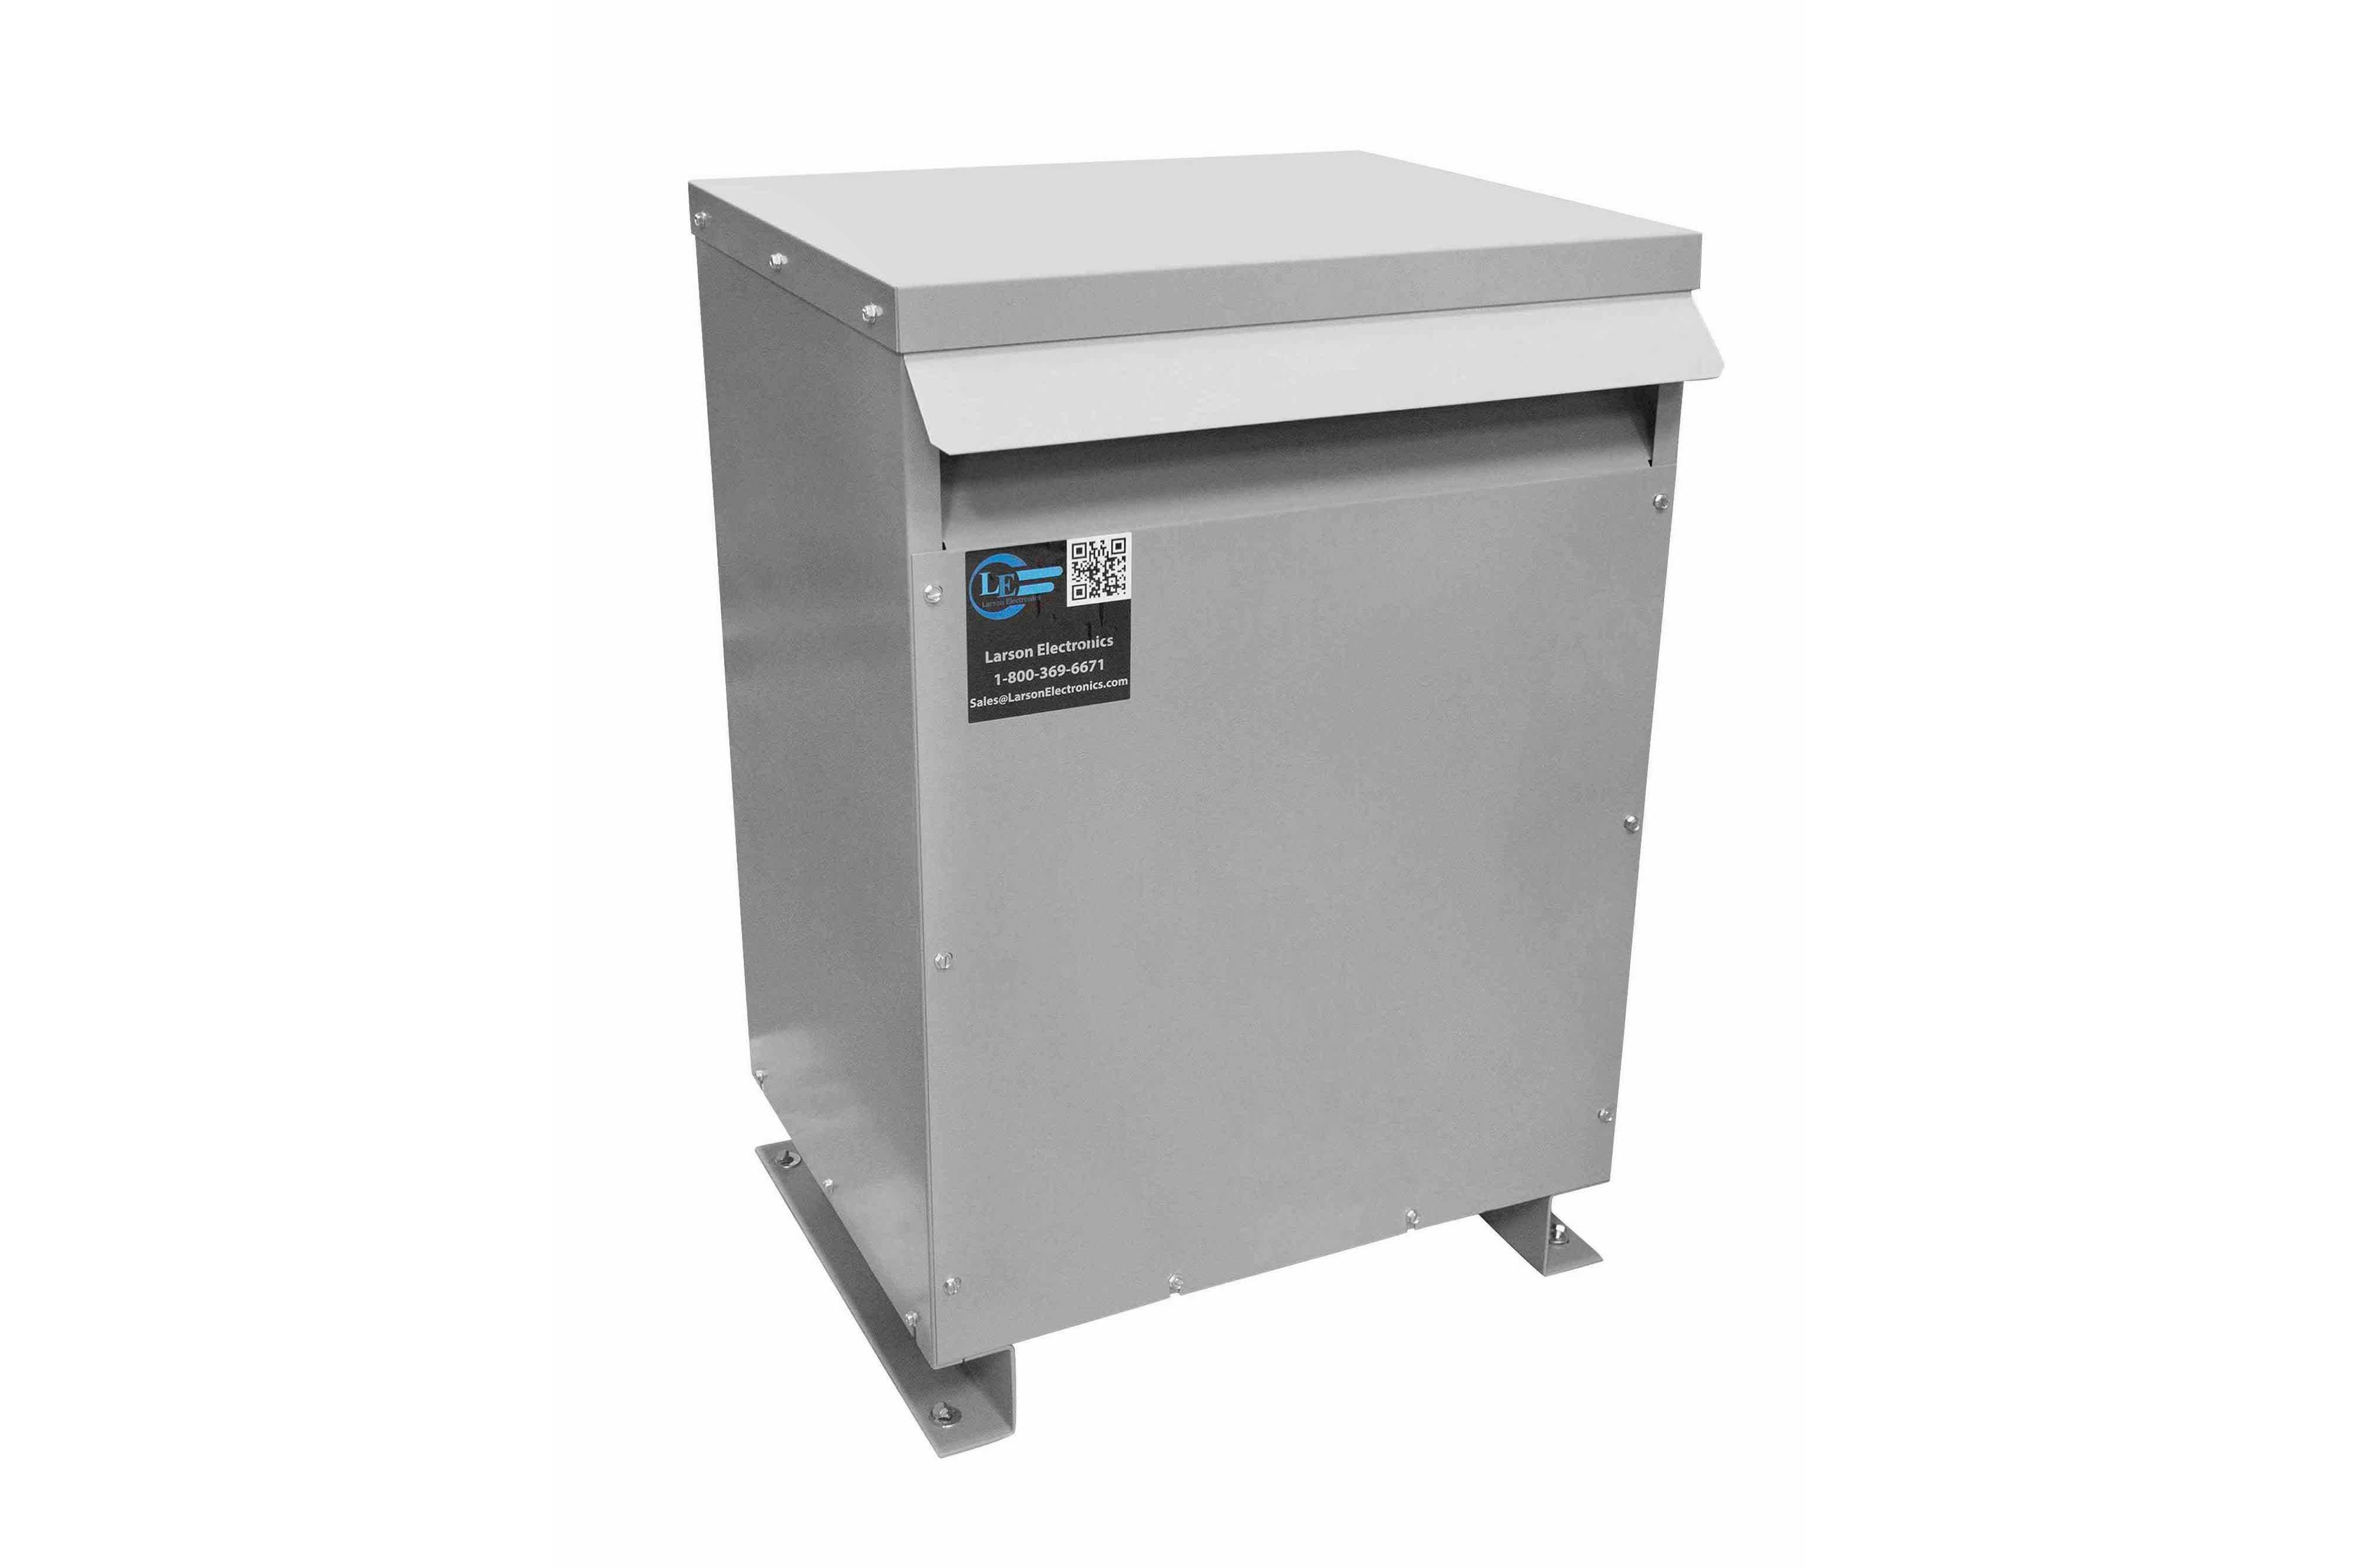 26 kVA 3PH Isolation Transformer, 220V Wye Primary, 208Y/120 Wye-N Secondary, N3R, Ventilated, 60 Hz